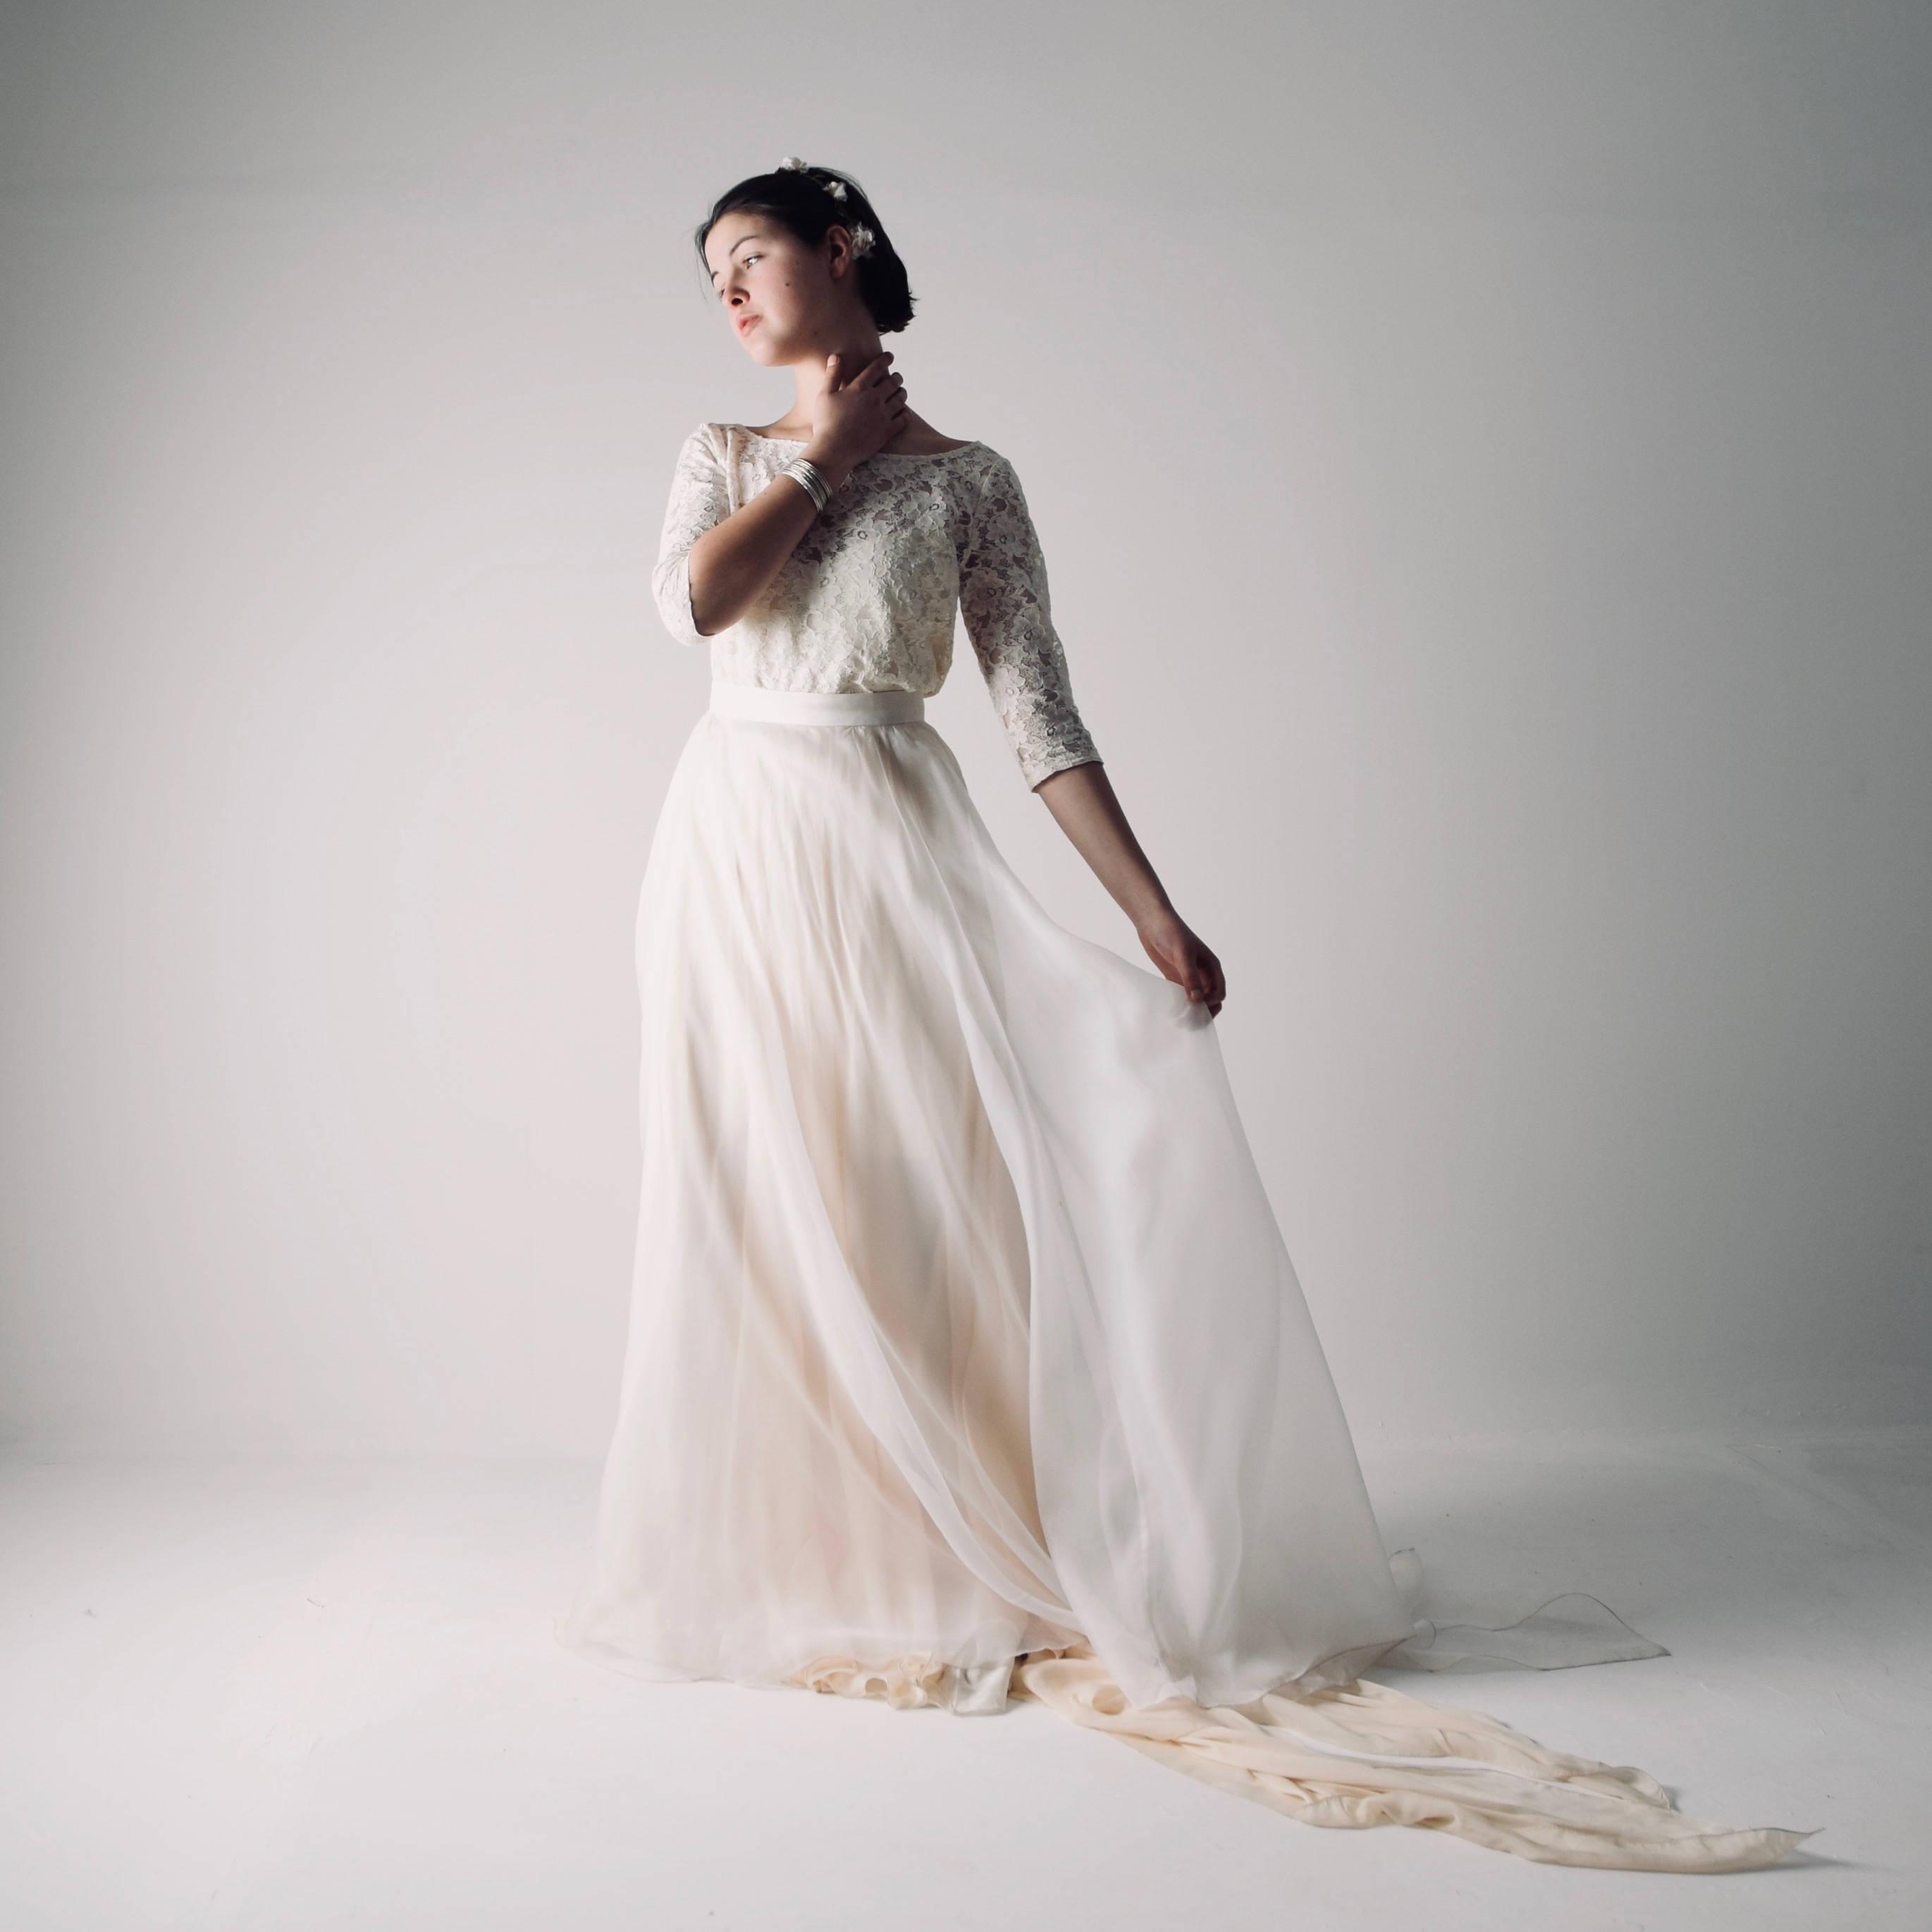 Modest lace wedding dress ~ Long sleeve Lace dress by Larimeloom